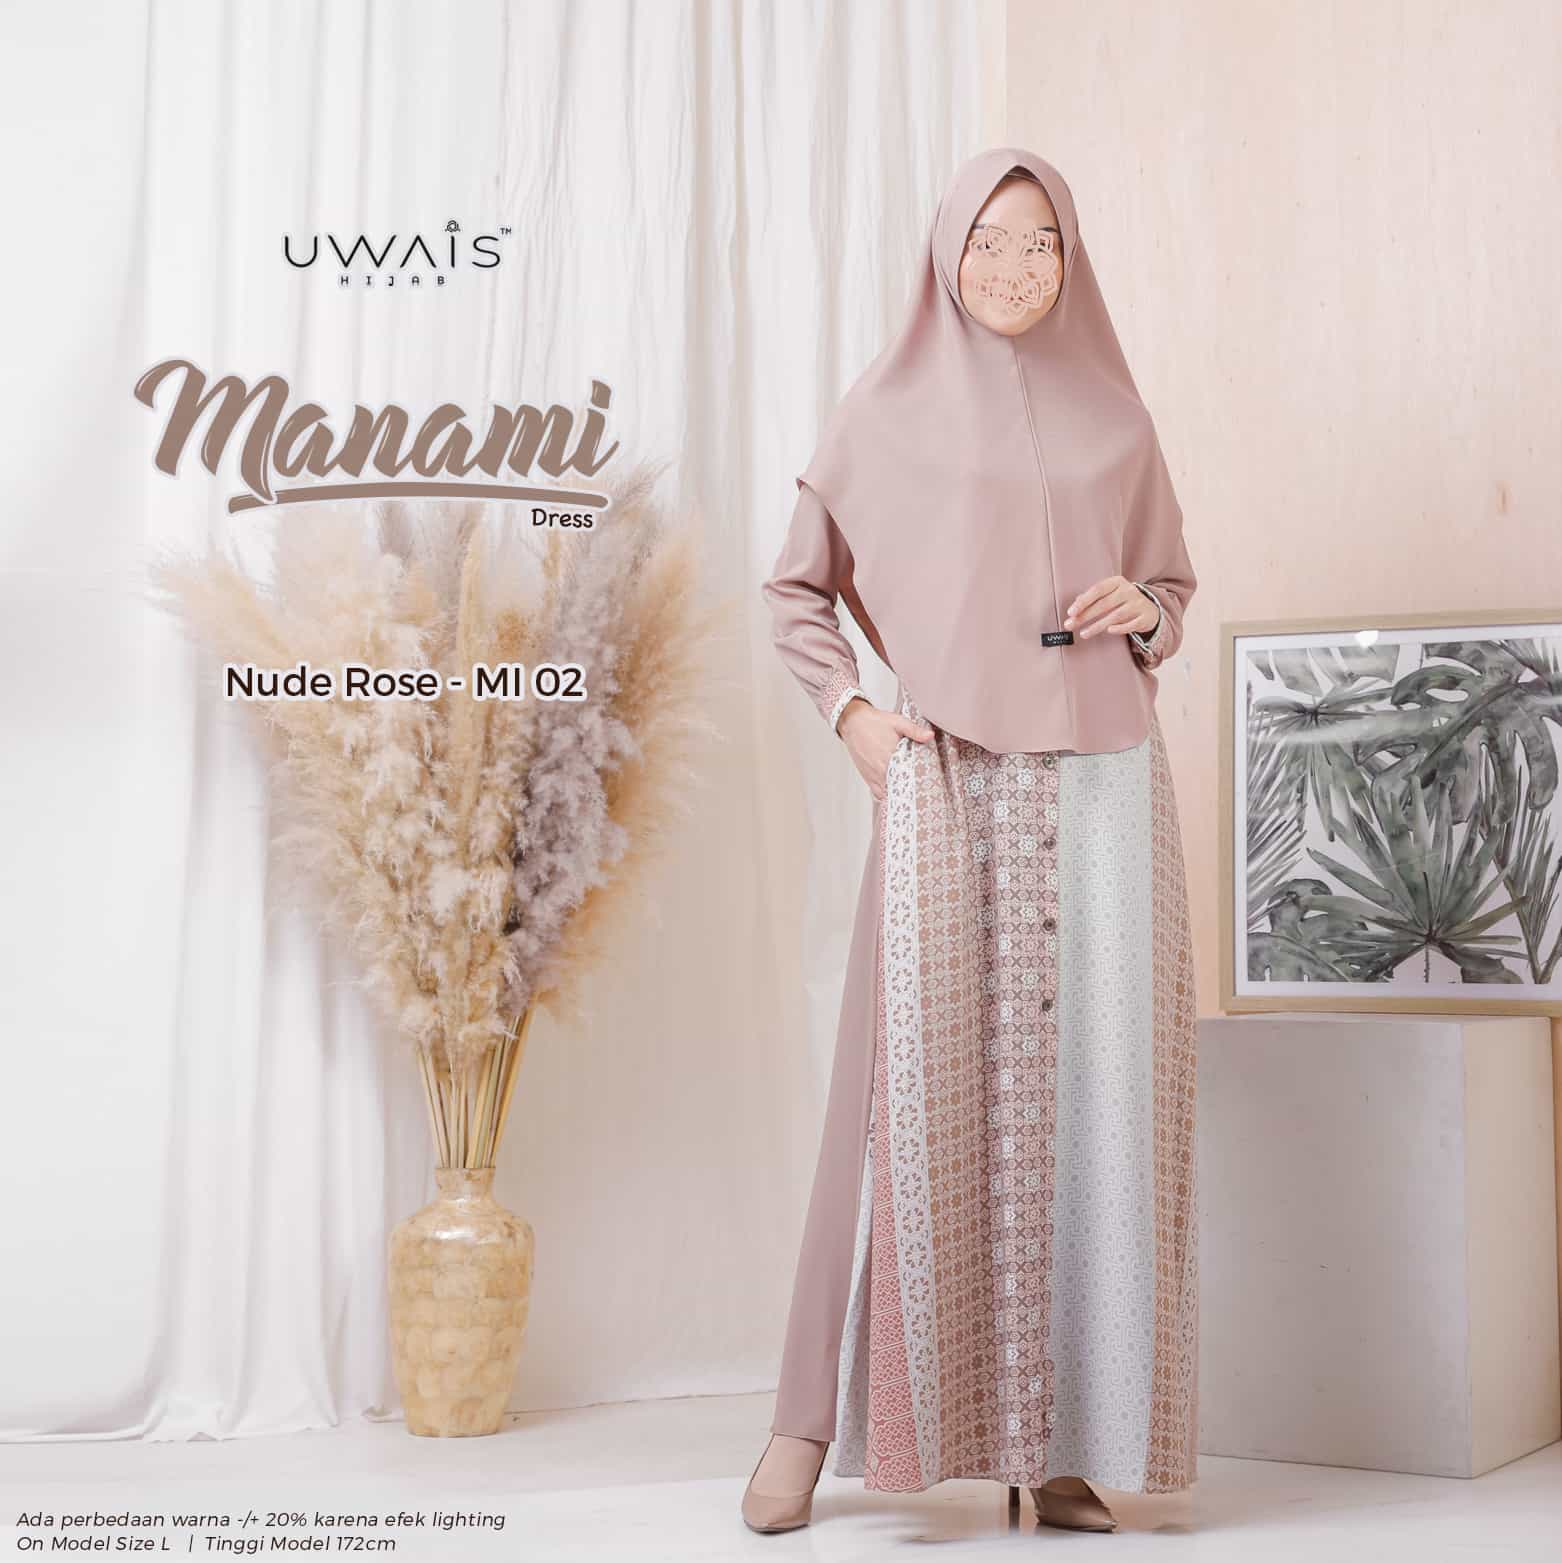 nanami_dress_nude_ro_sQnHA